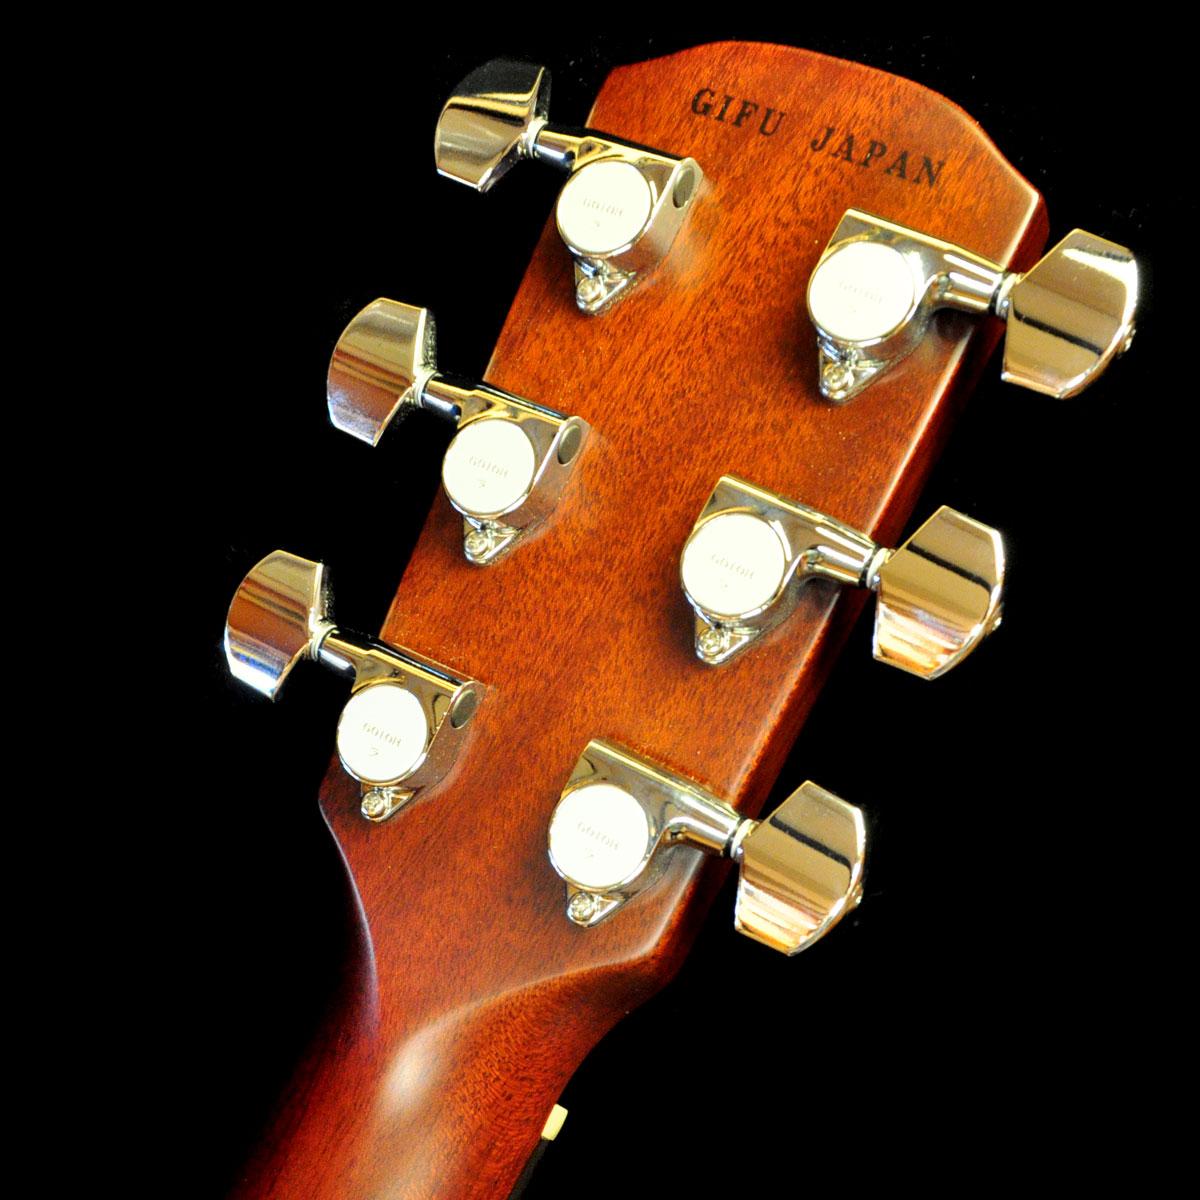 K Yairi Bl 95 Sb Shimokura Musical Instruments